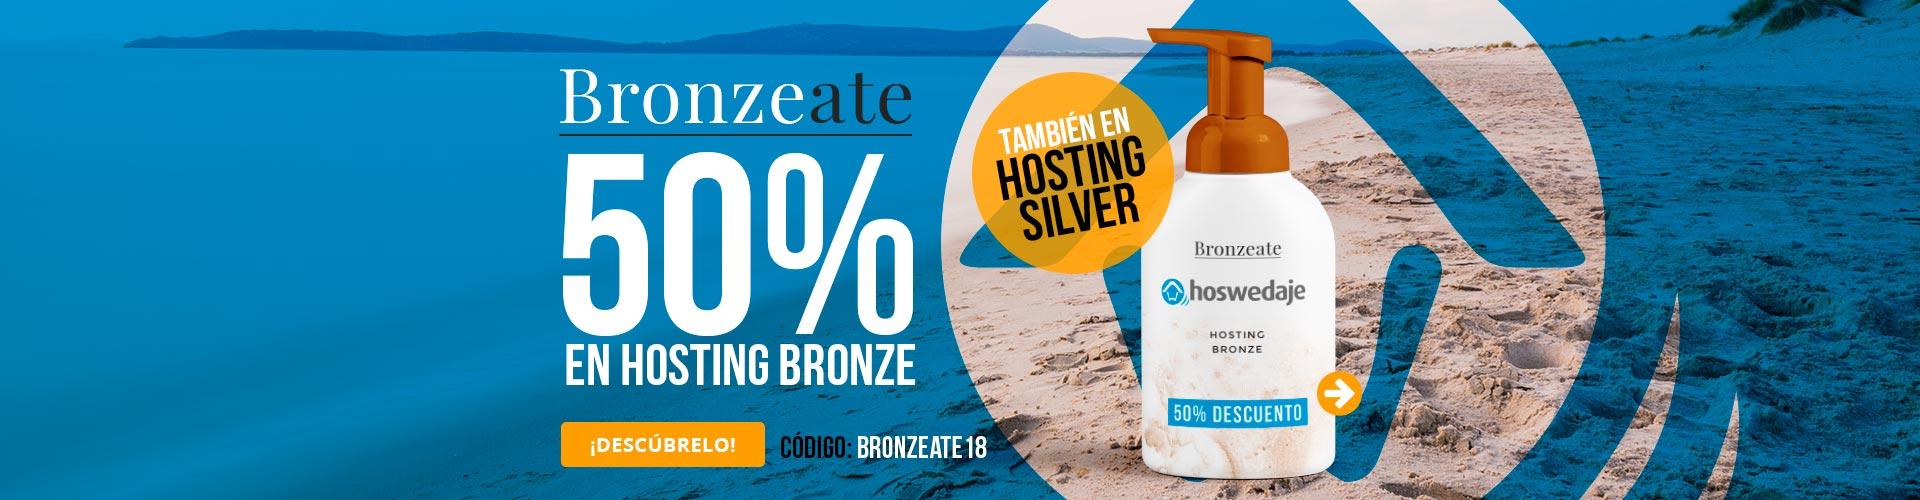 Bronzeate2018